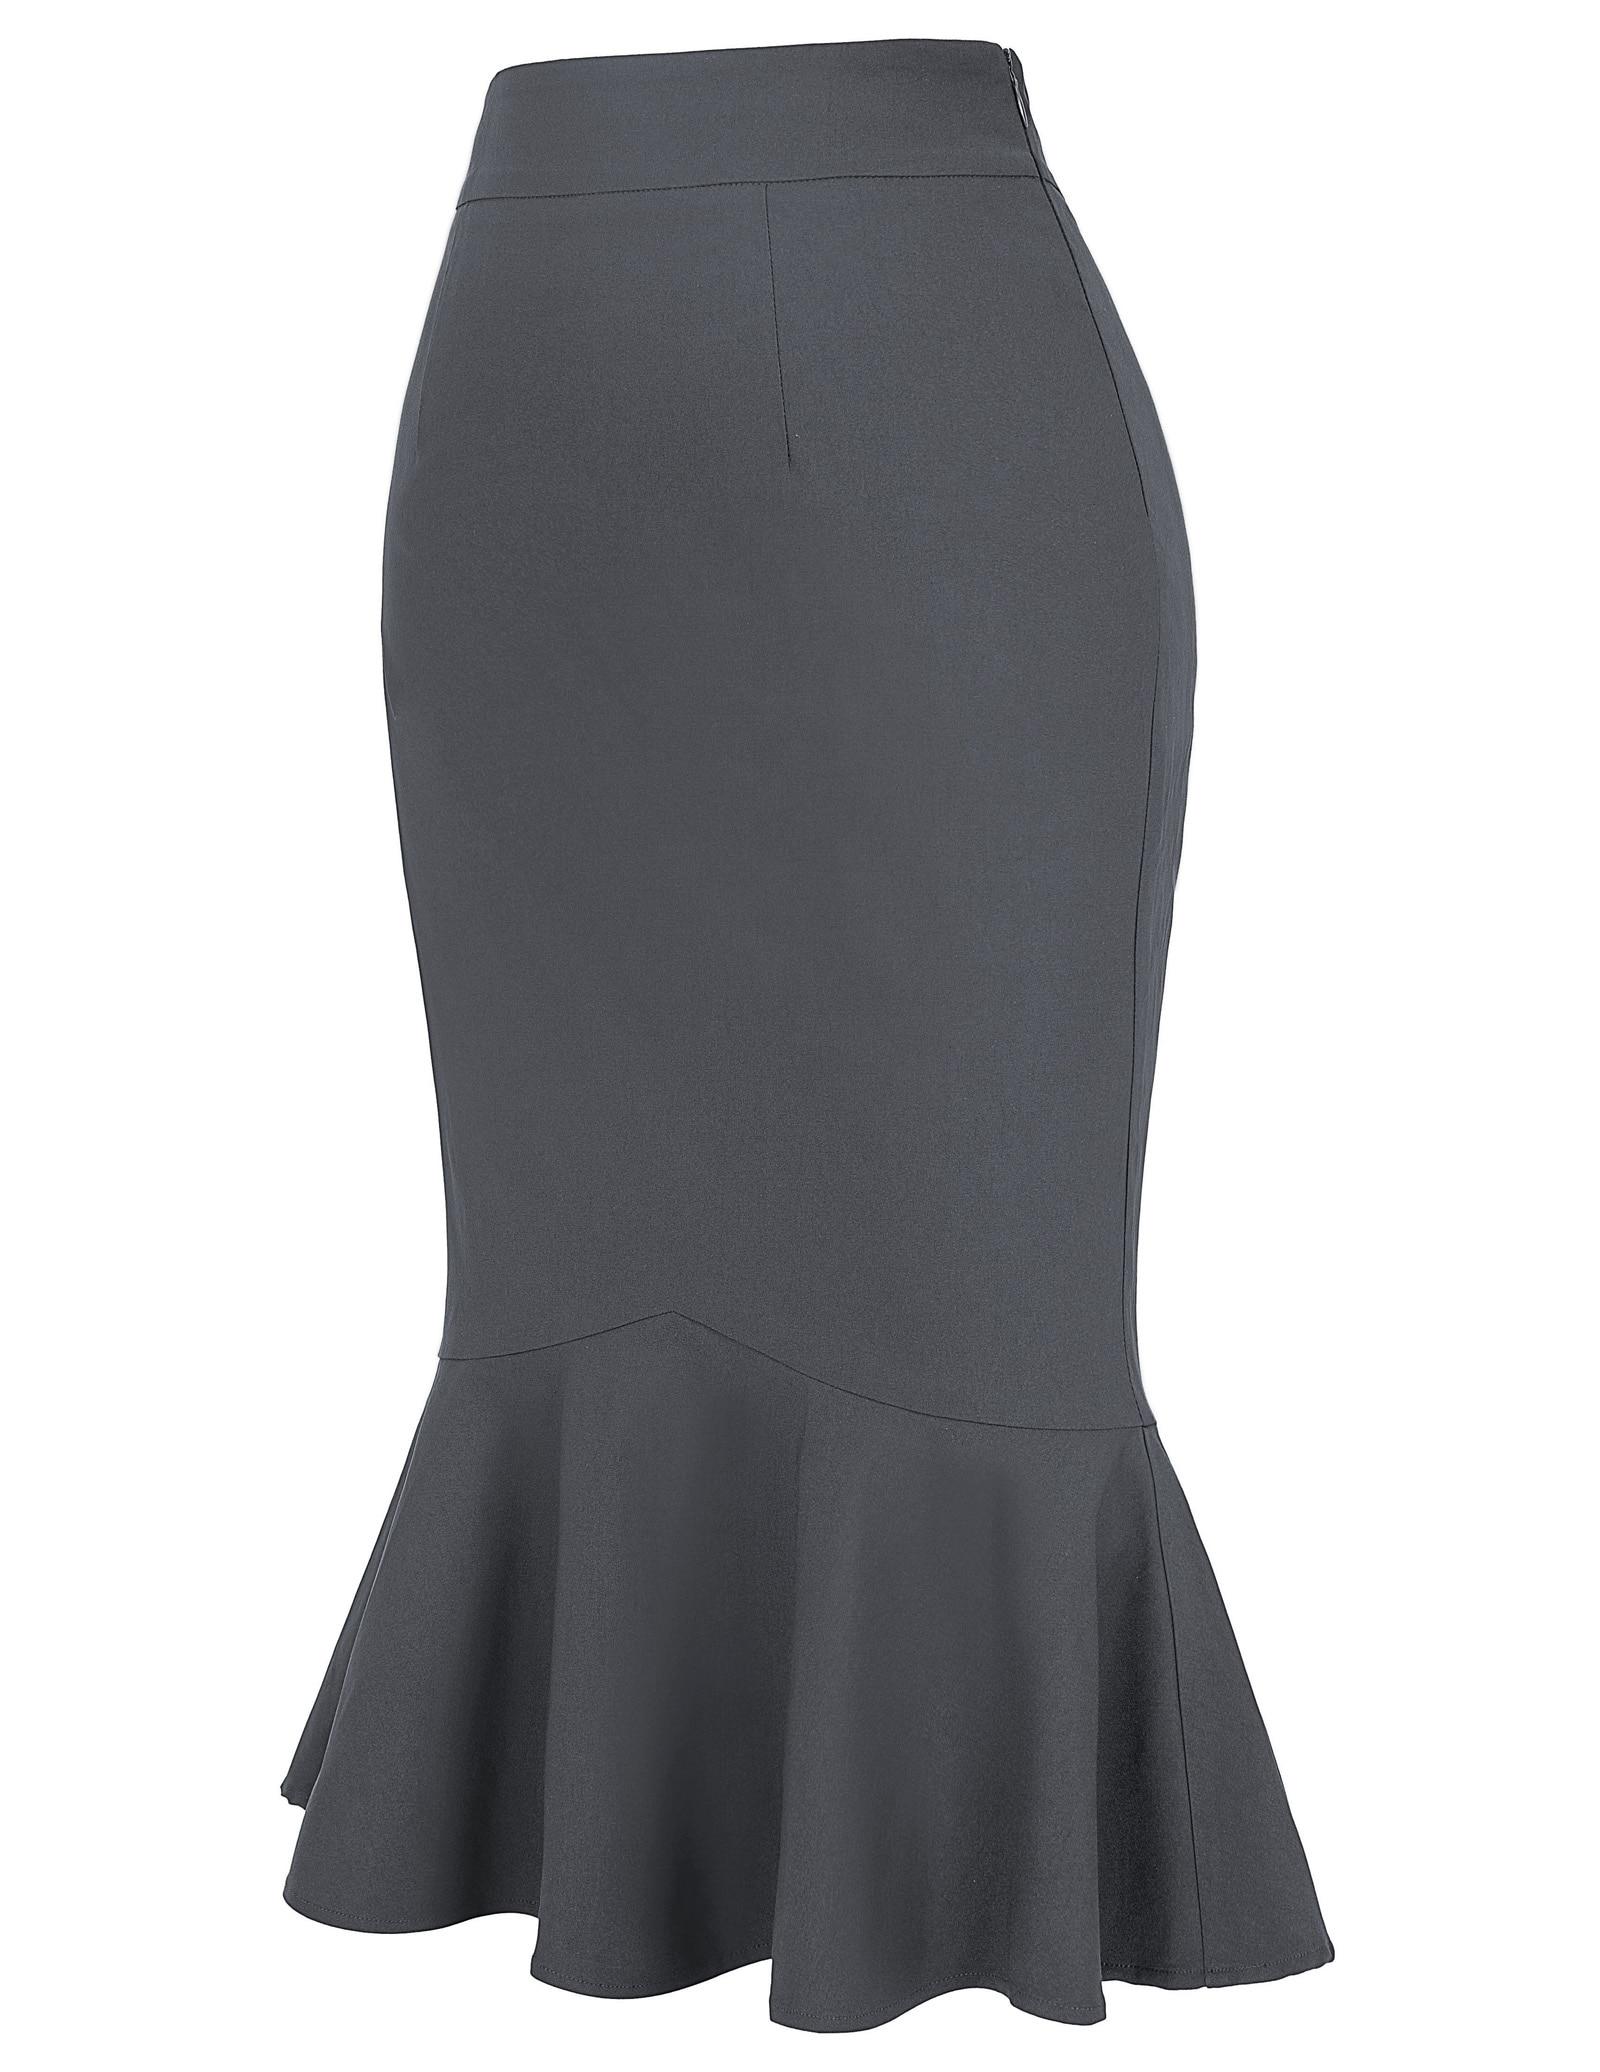 Kate Kasin Vintage Mermaid Wiggle Ruffled Pencil Skirt Pin Up 40s 50s Party